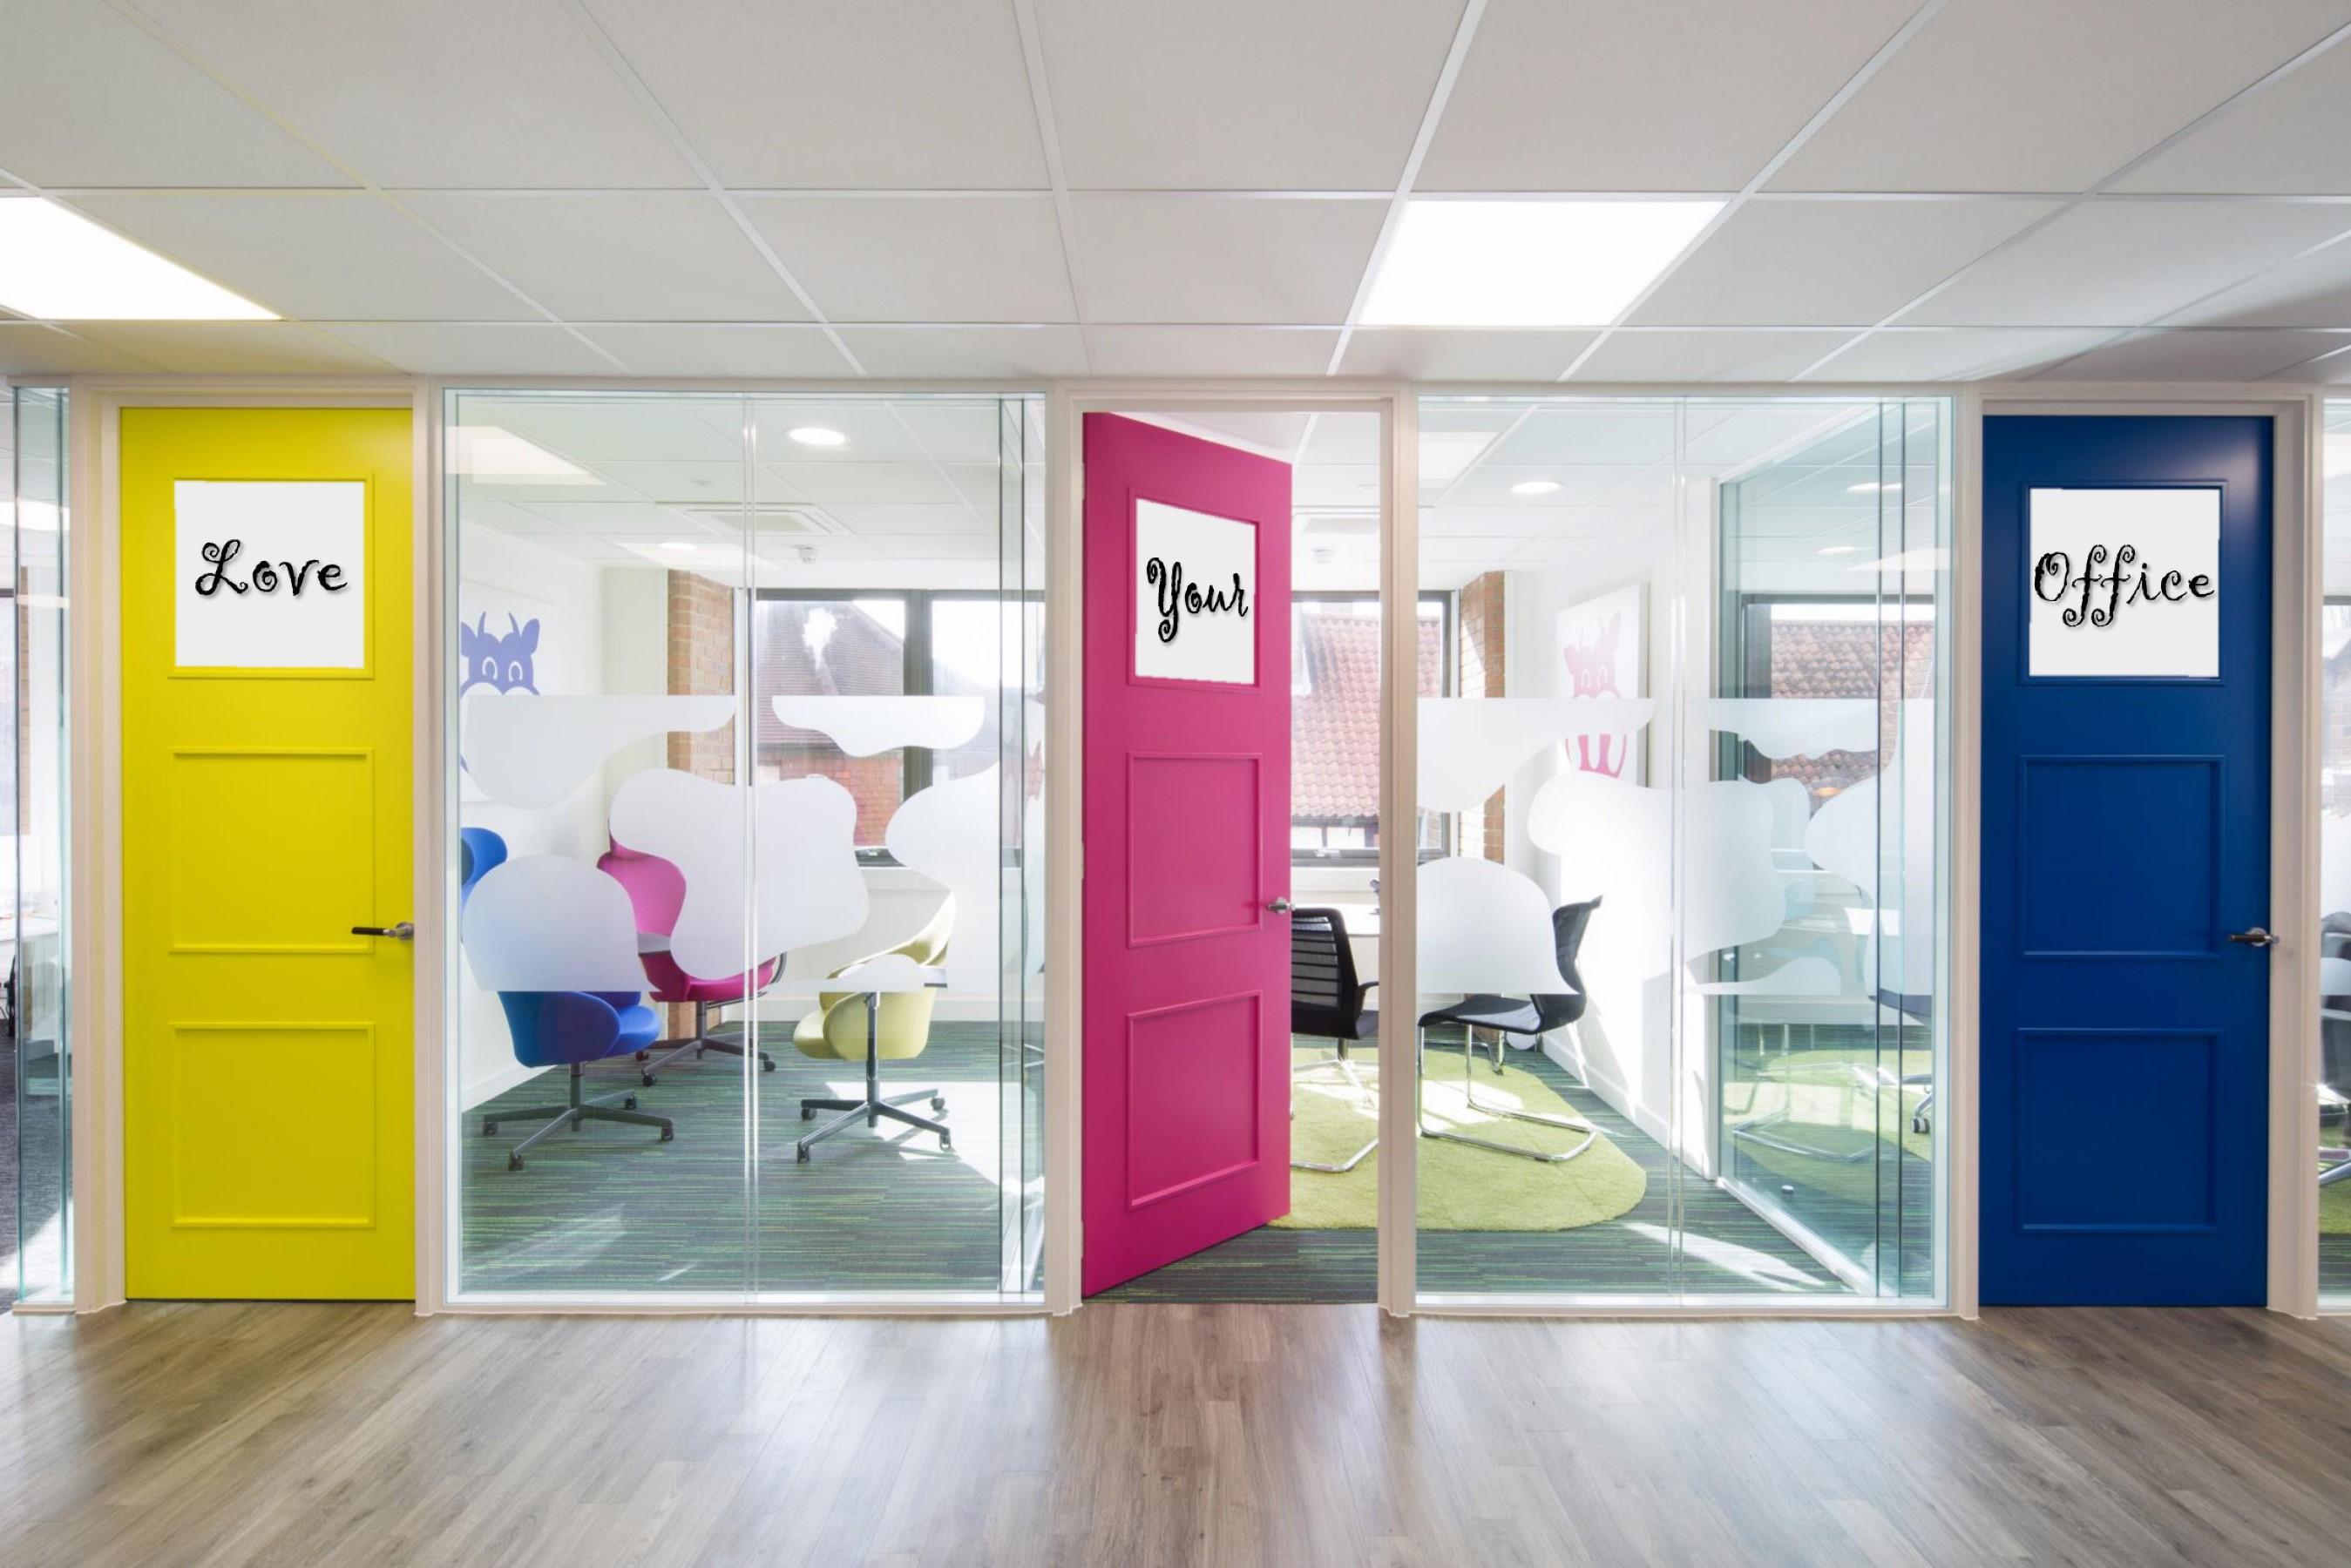 Office principles blog for Office design principles